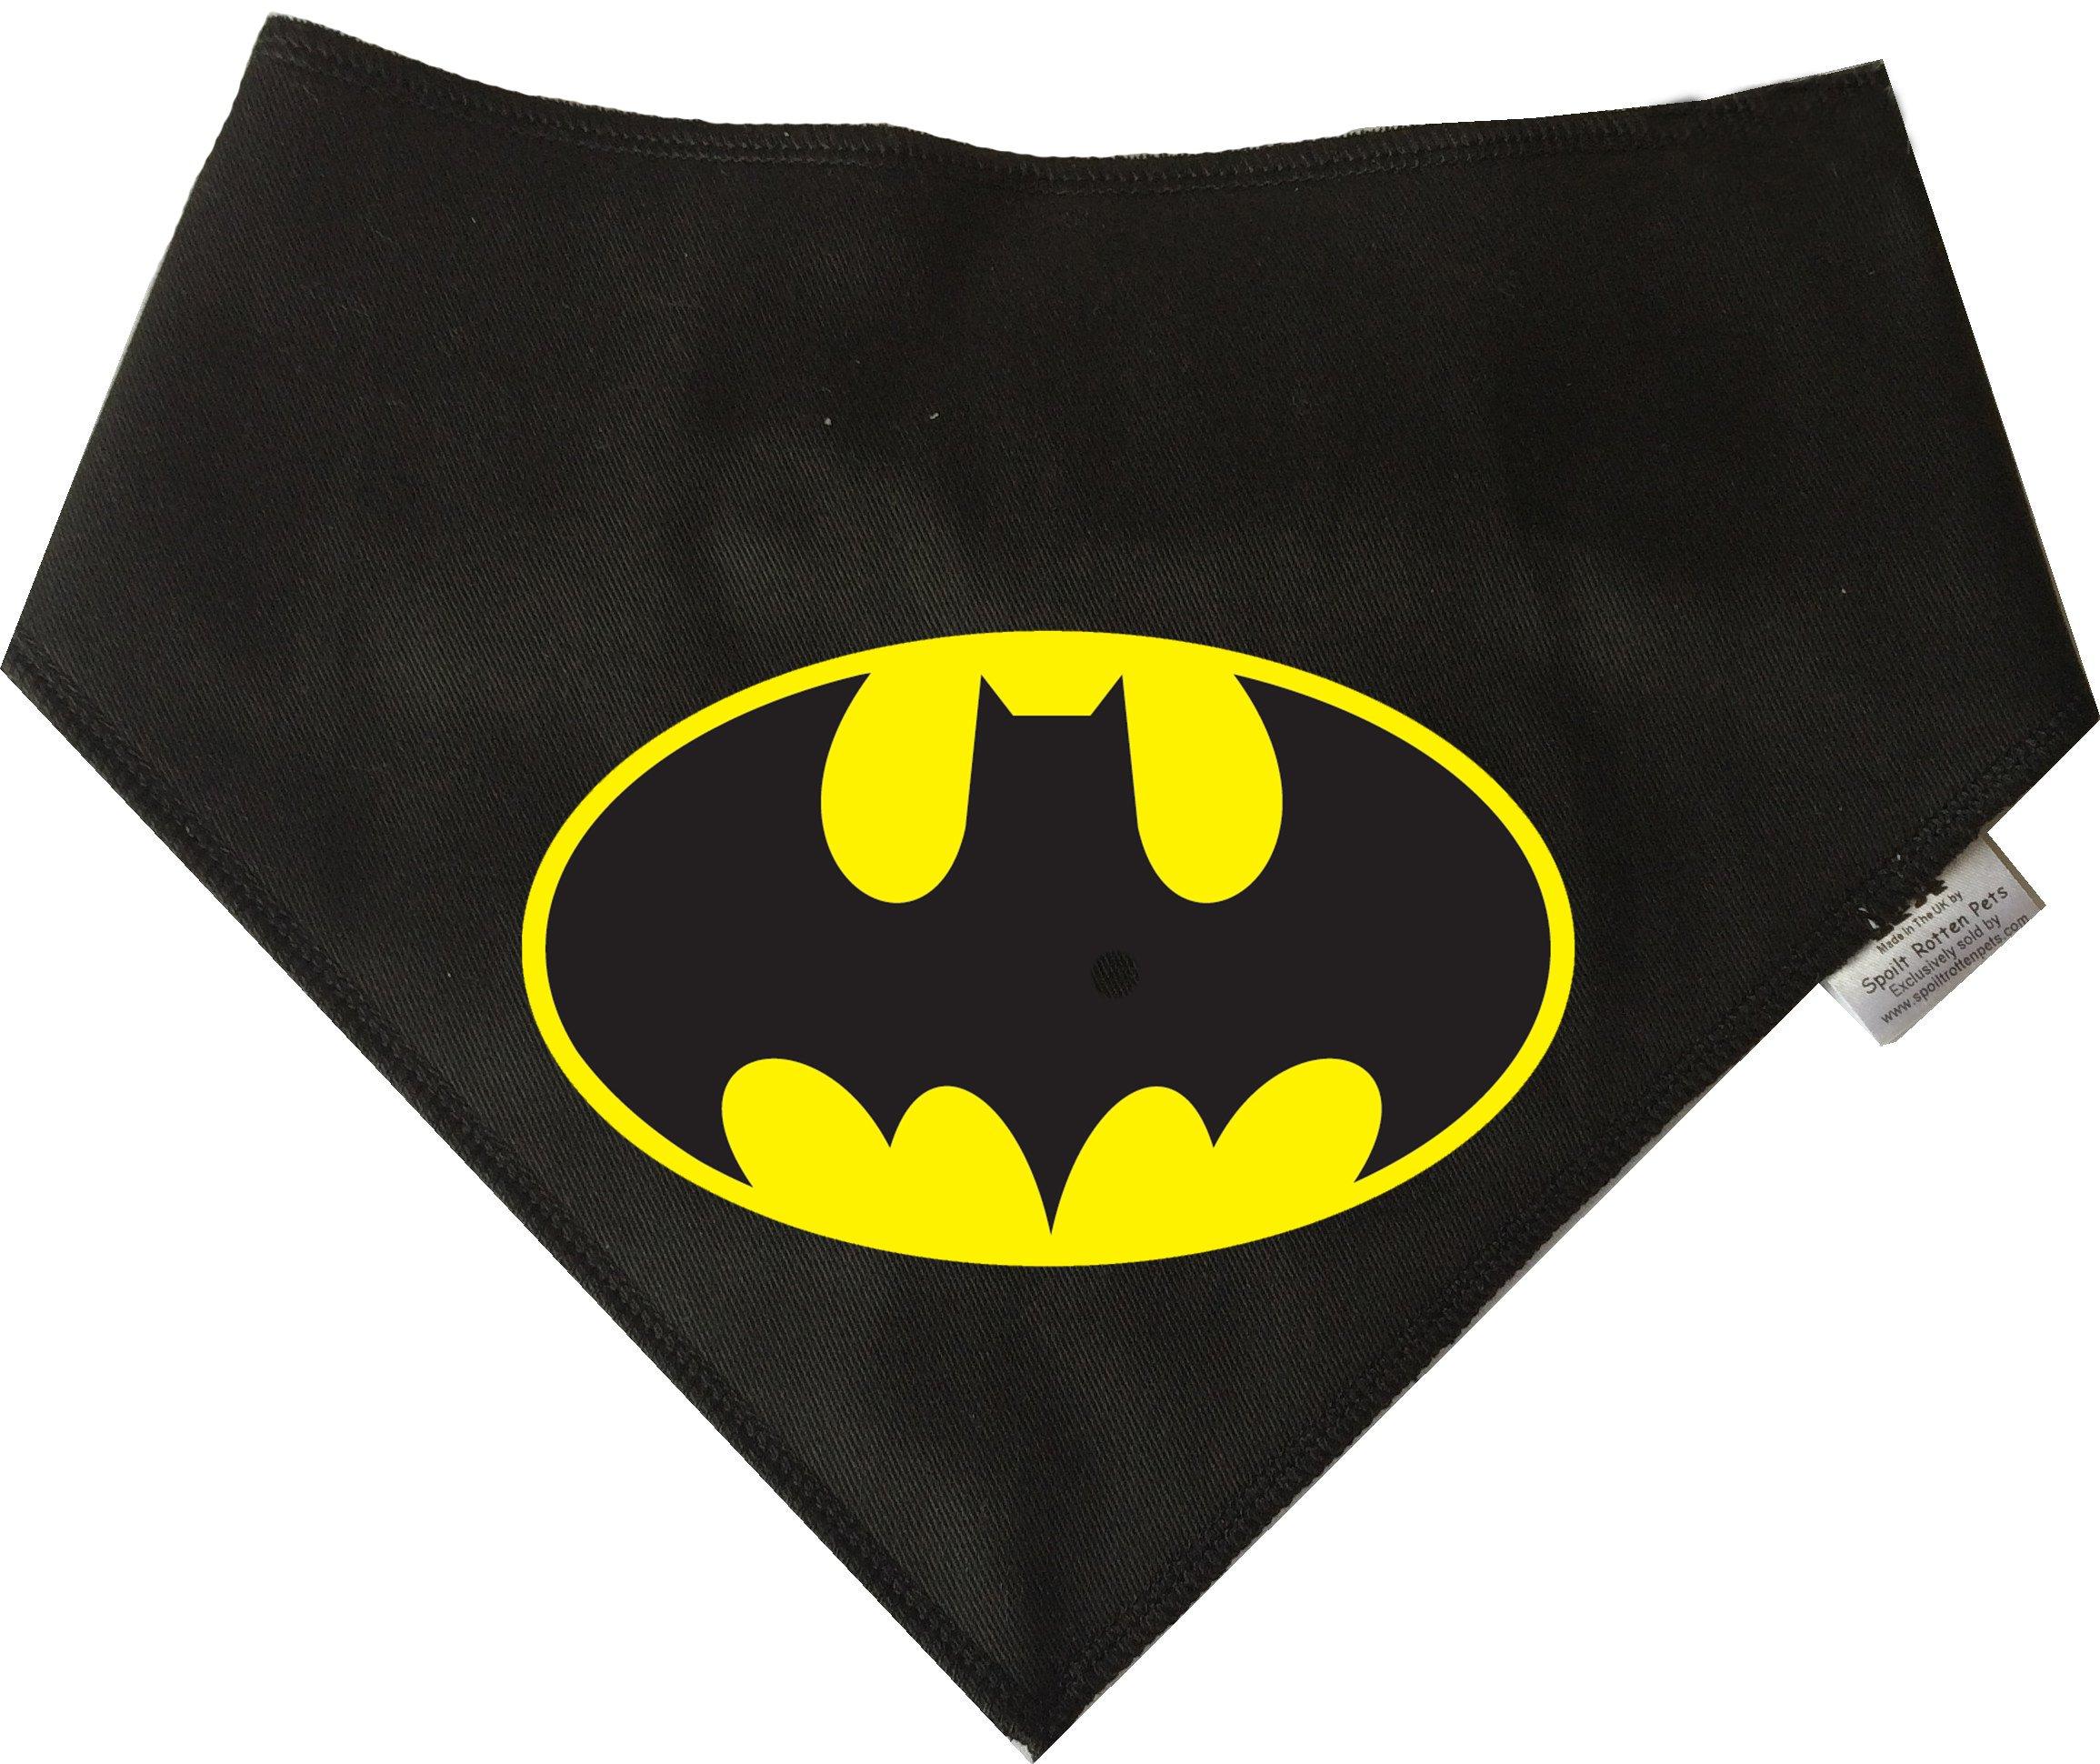 Spoilt Rotten Pets, S4 BAT DOG, Large Black Dog Bandana. Batman Inspired Bandana Suitable For Husky, GSD, Newfies & Chow Chow Sized Dogs